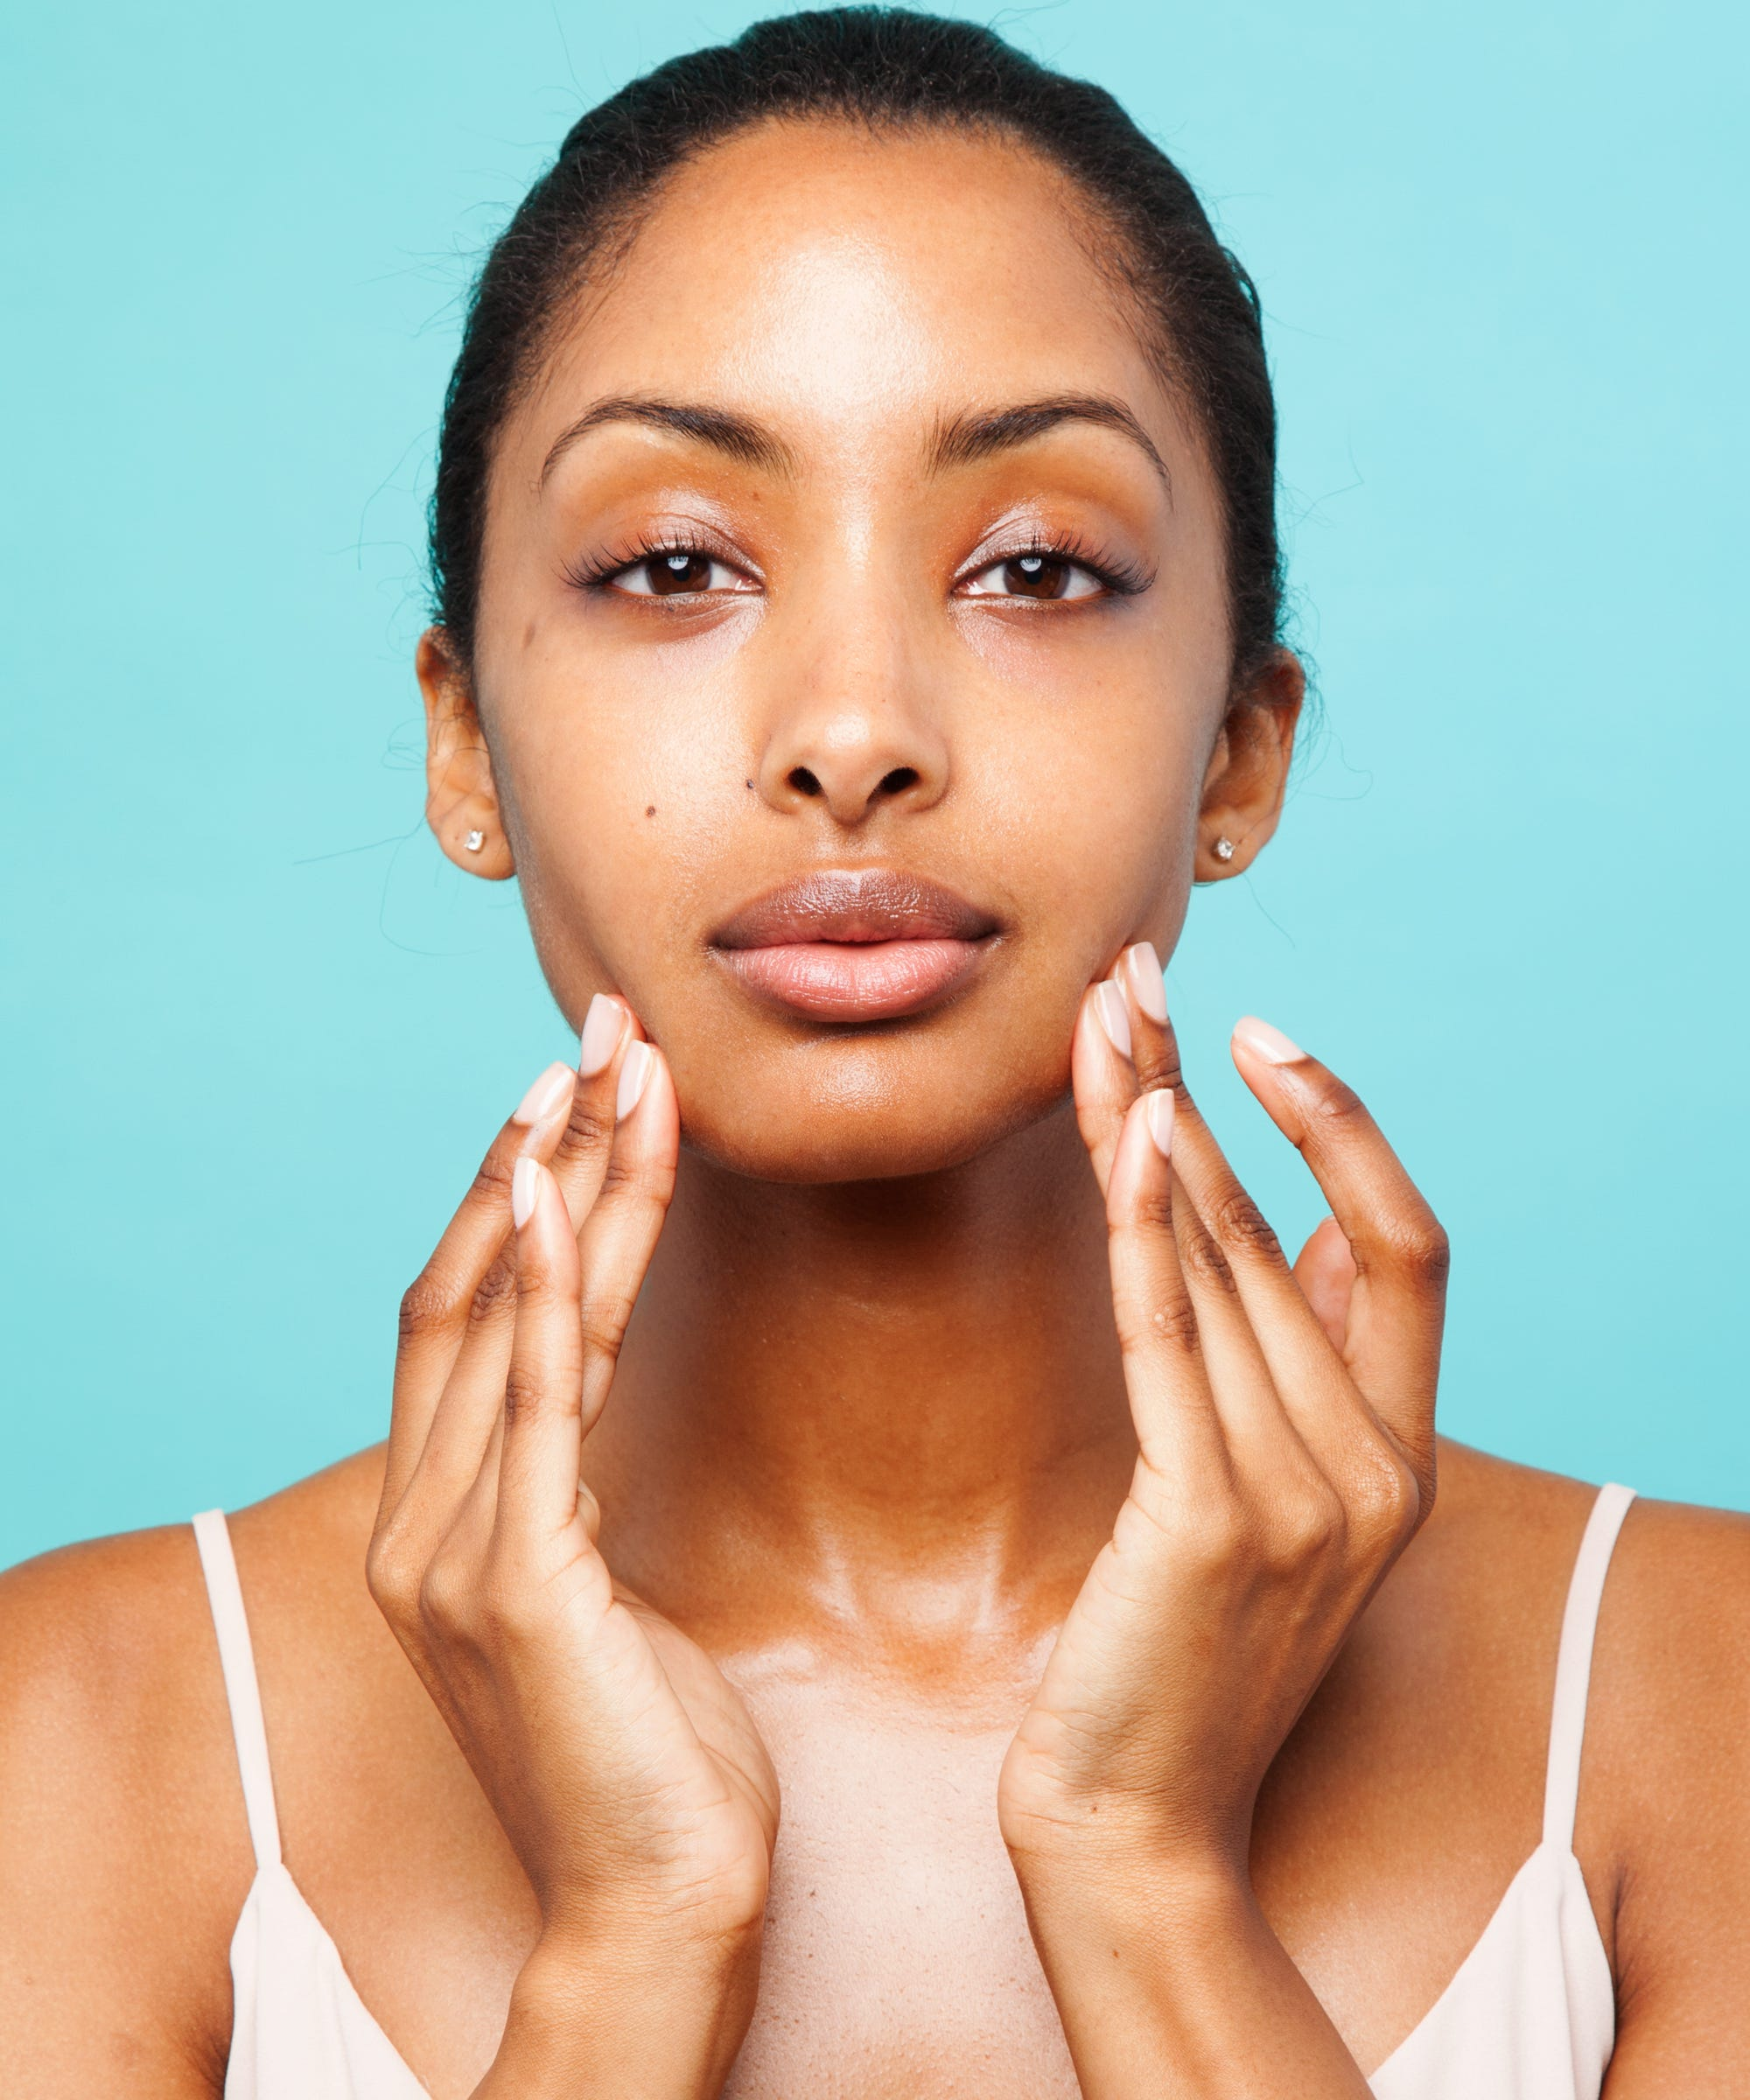 Skin Care Expert Drugstore Recommendation Mens Biore Body Foam Facial White Energy